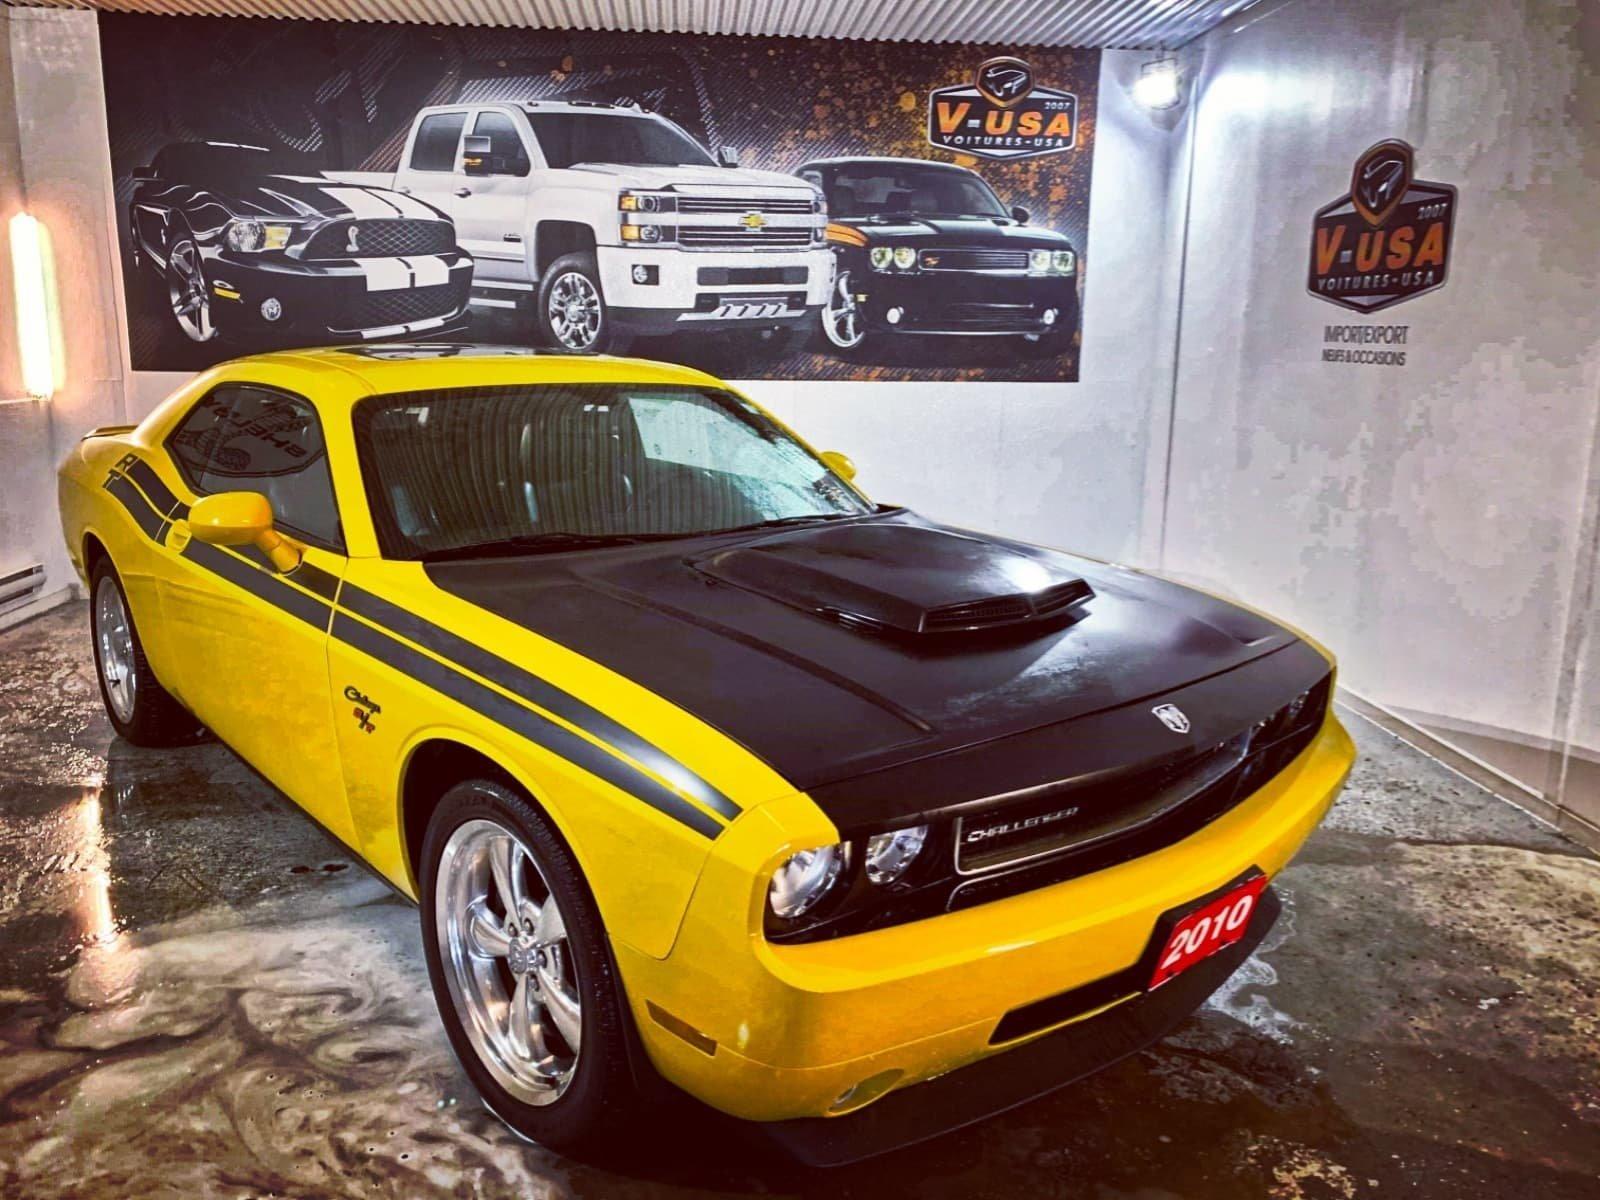 Heurty (Dodge Challenger RT 2010) 1582571257-80106403-460718071487616-8049741333817982976-n